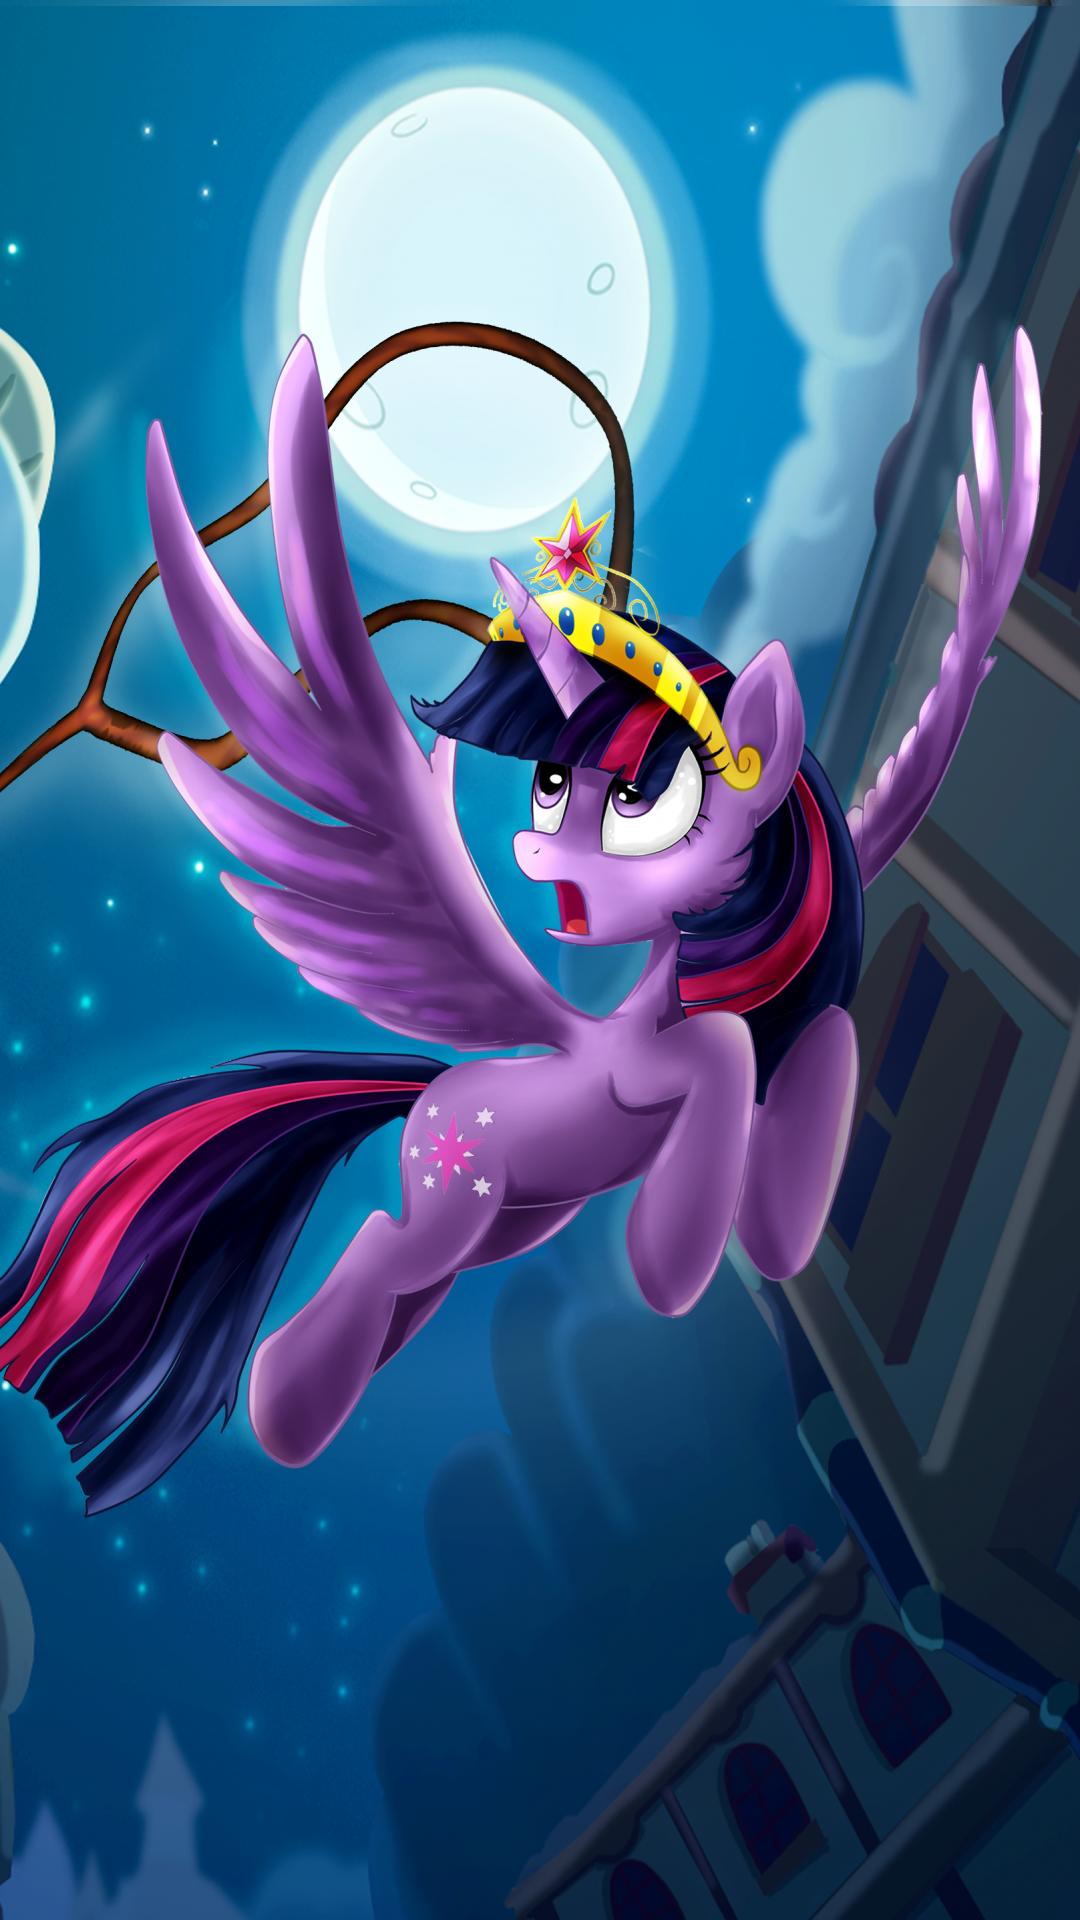 tv show/my little pony: friendship is magic (1080x1920) wallpaper id